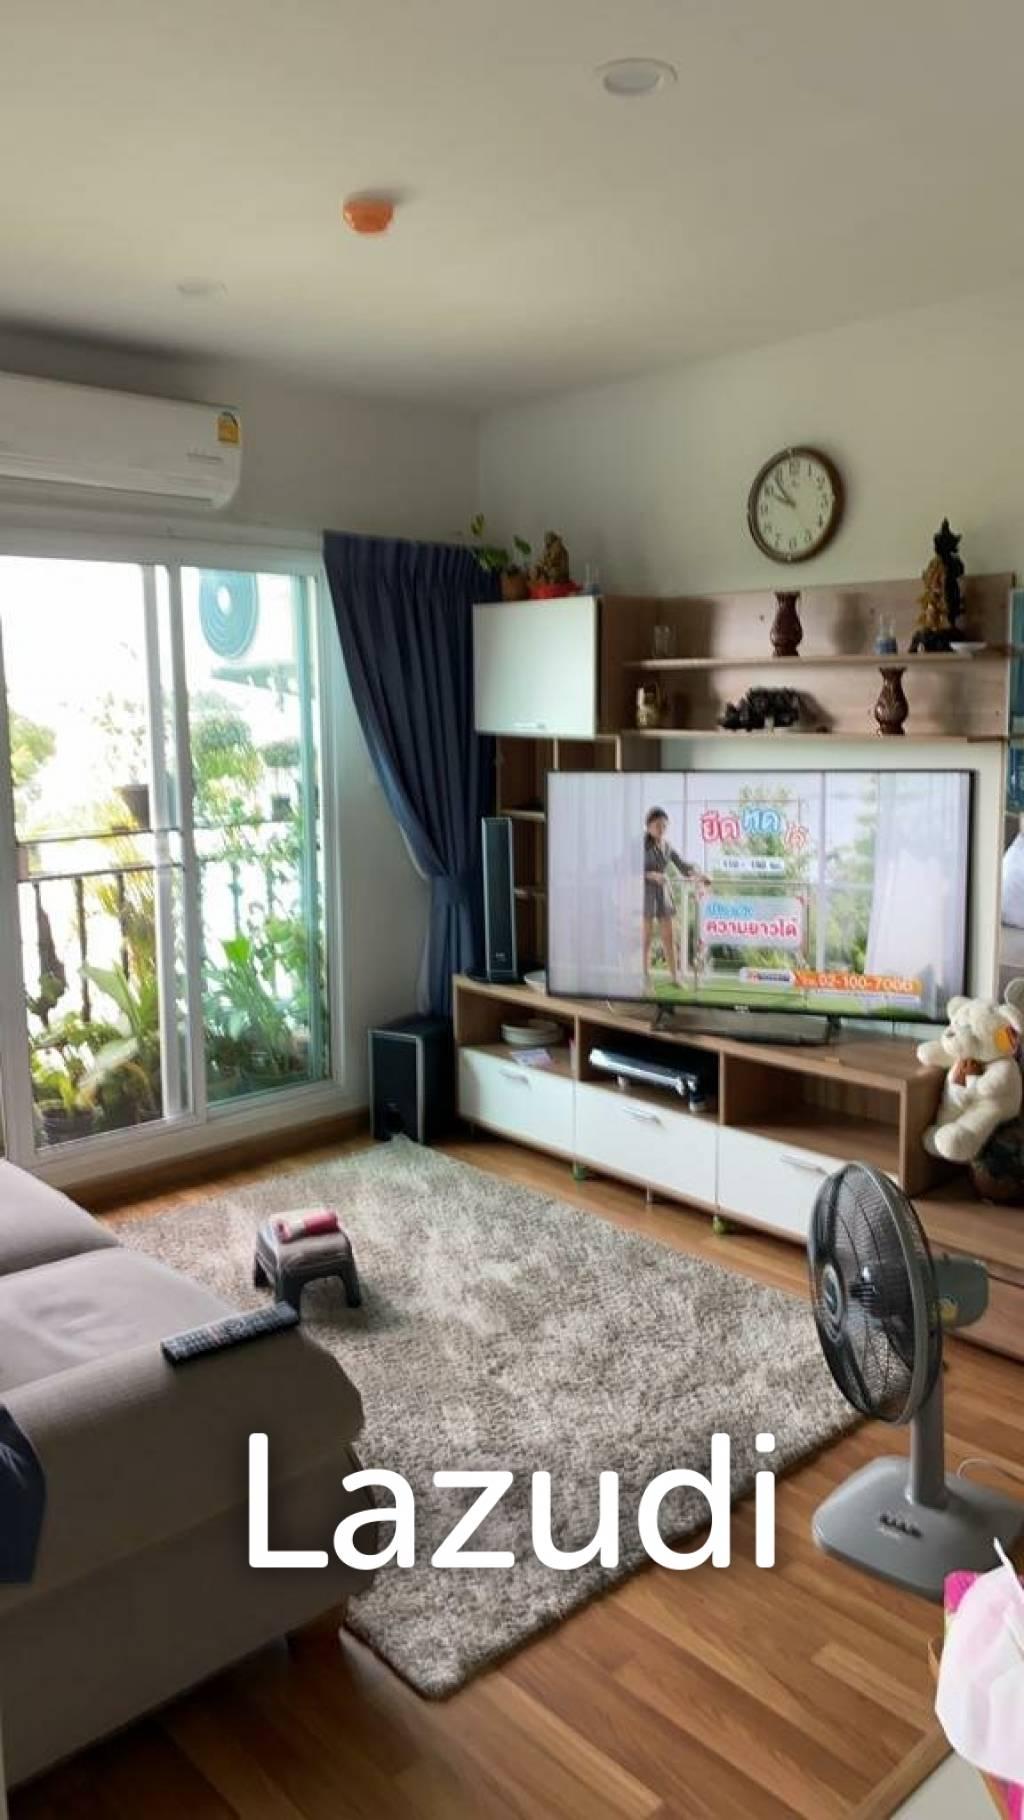 VERY HOT PRICE!! Anna Condo Ladprao 101 - Pho Kaew 1 For sale